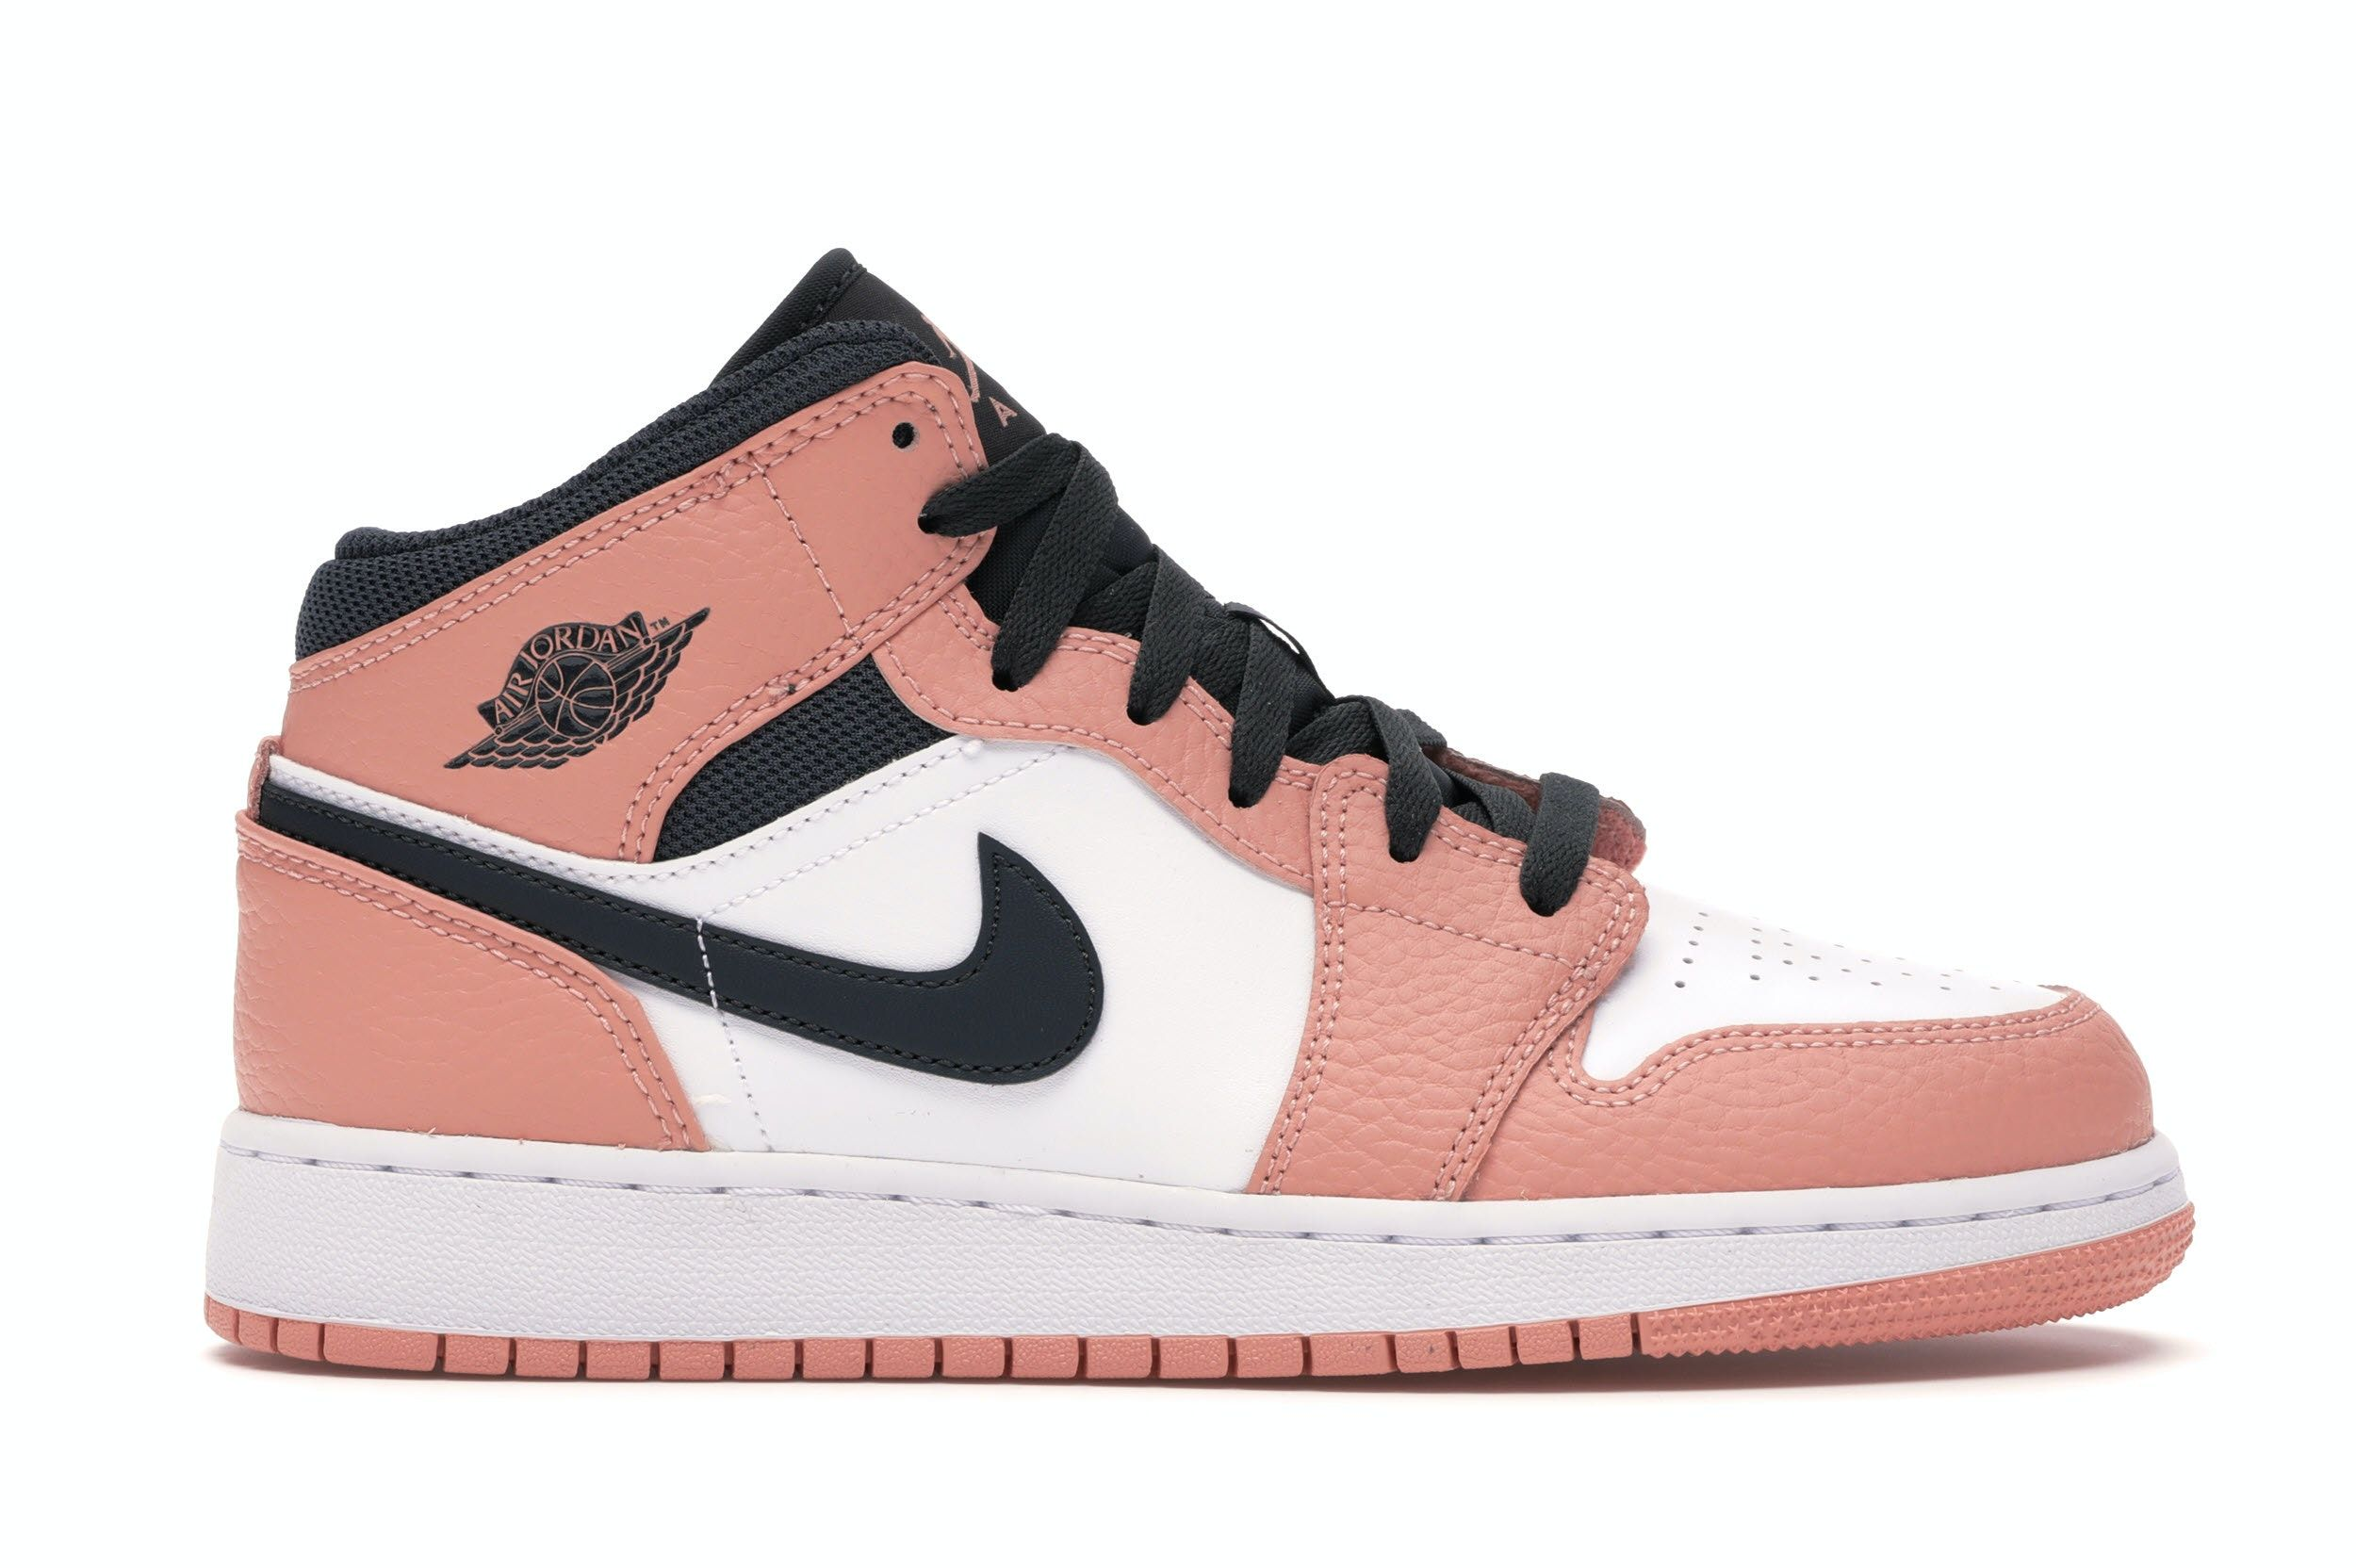 Jordan 1 Mid Pink Quartz (GS) in 2020 Pink jordans, Pink